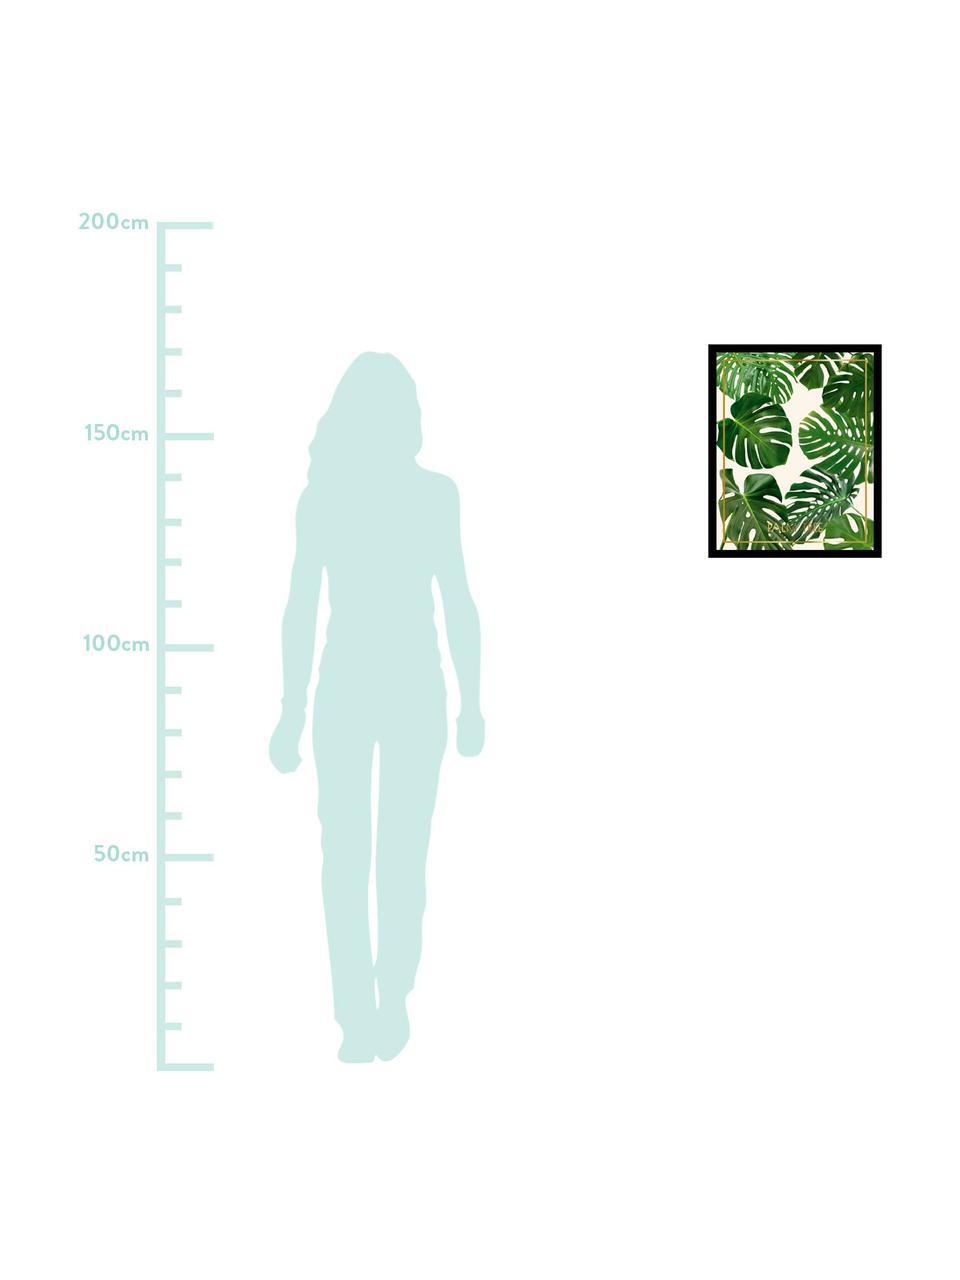 Gerahmter Digitaldruck Palm Tree II, Bild: Digitaldruck, Rahmen: Kunststoffrahmen mit Glas, Mehrfarbig, 40 x 50 cm